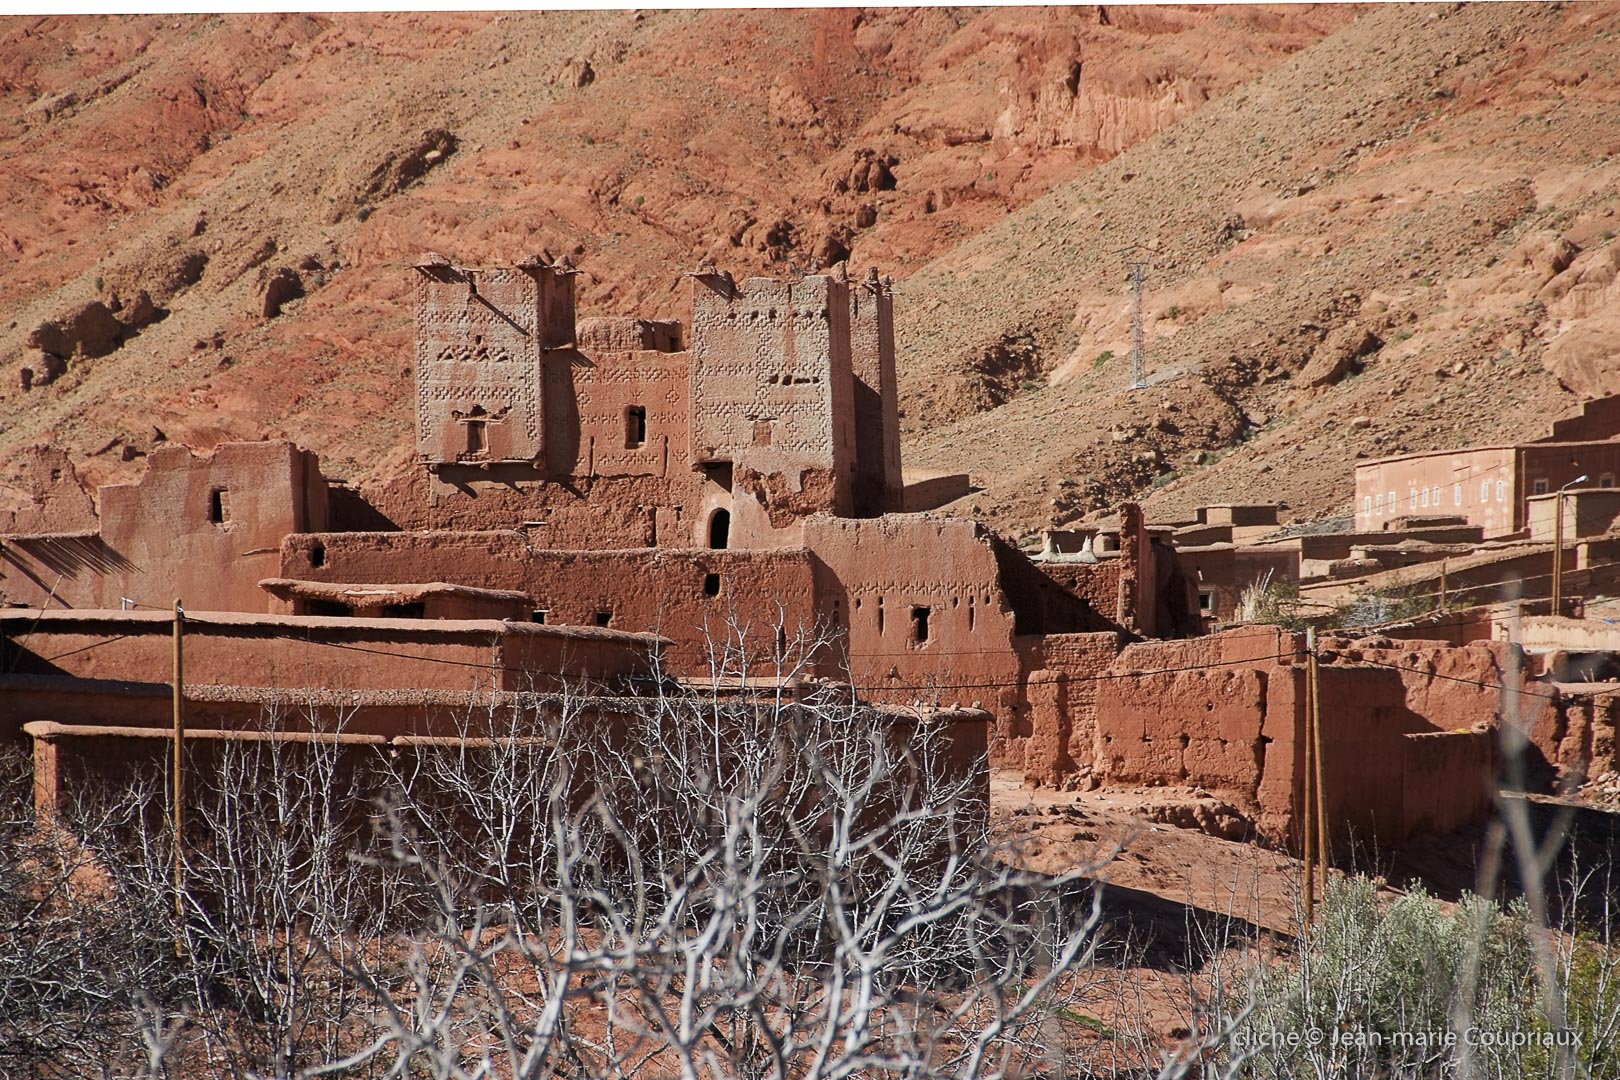 2007_Maroc-153-1